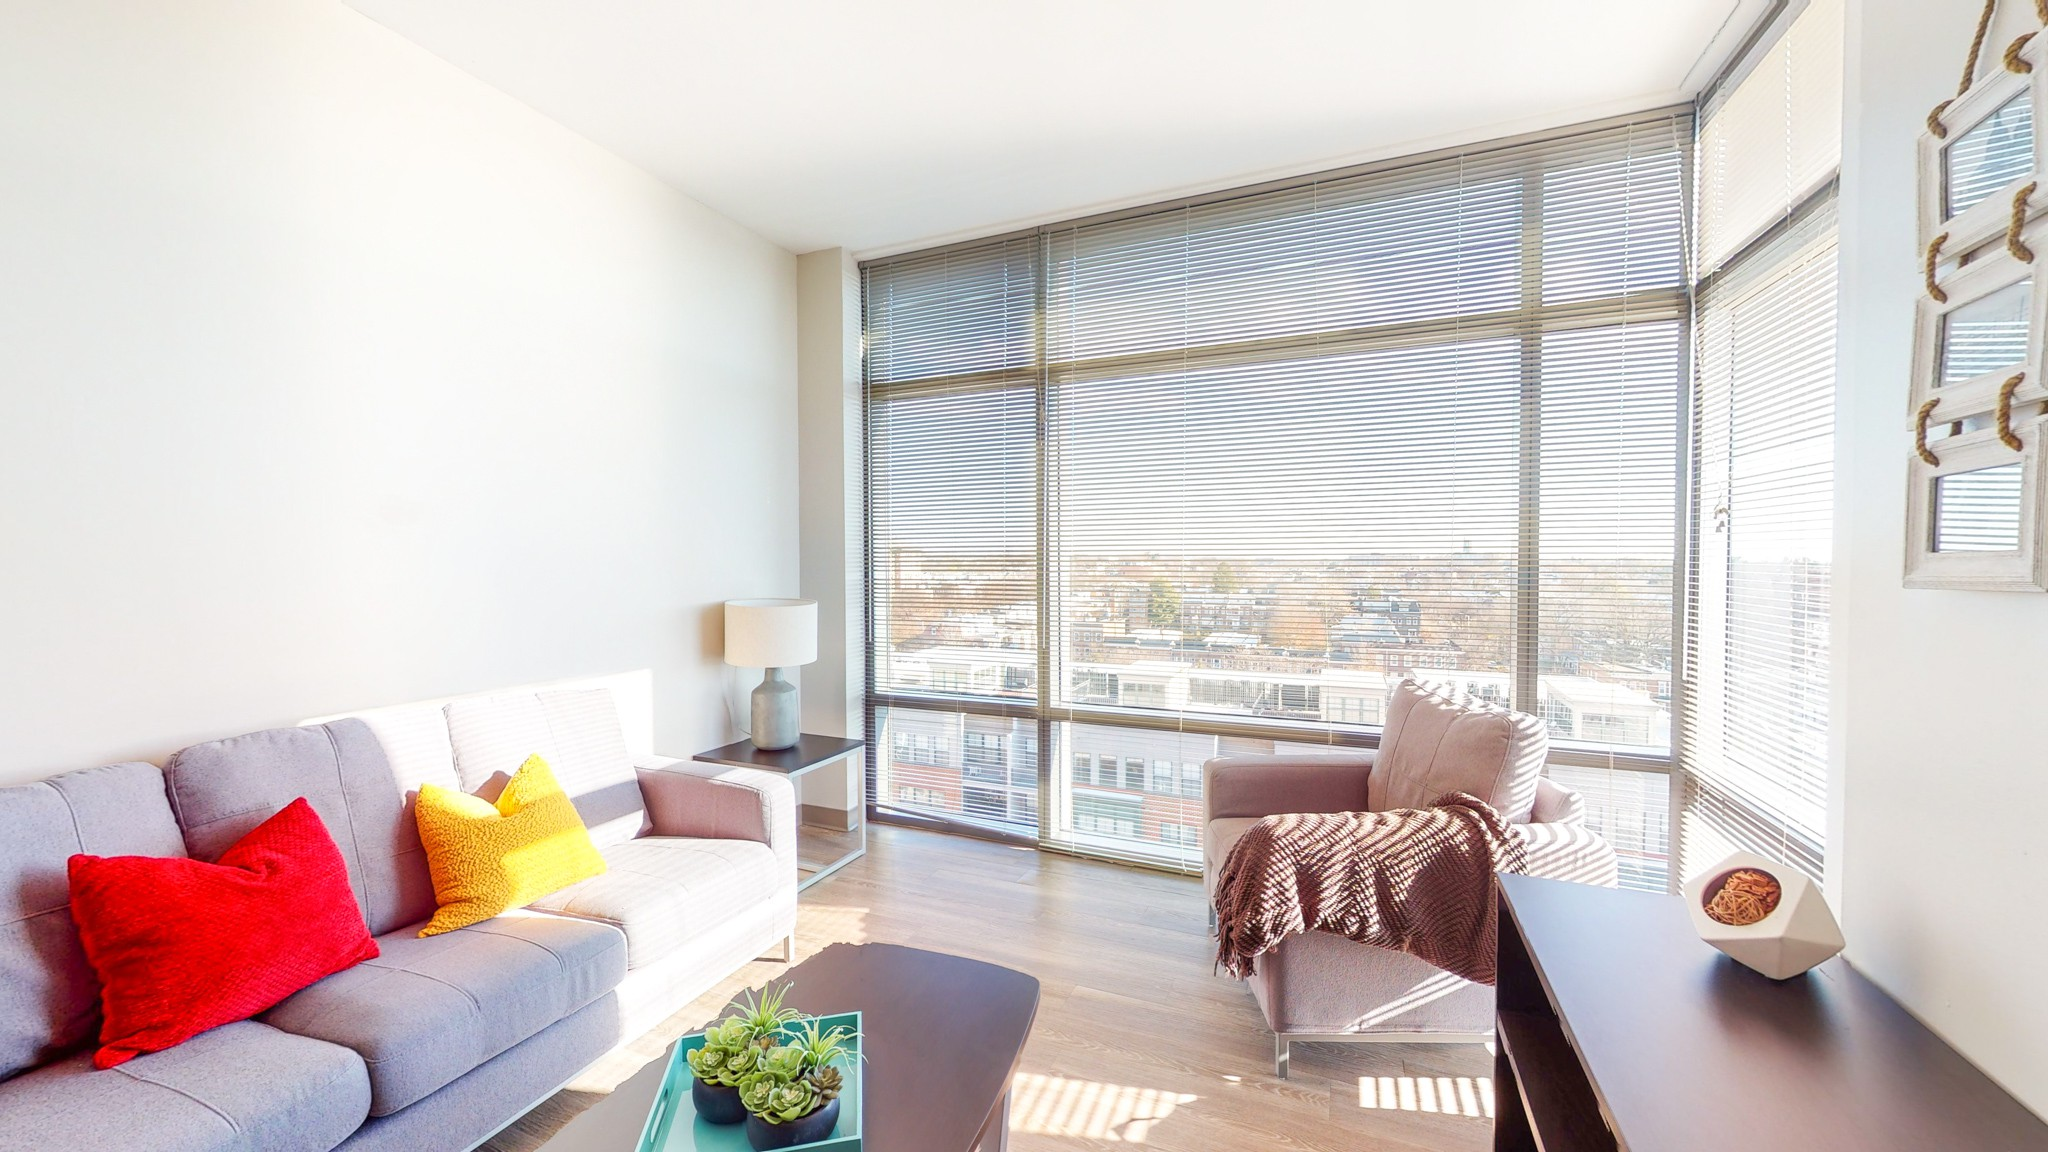 Apartments Near Glen Burnie Nine East 33rd - Room for Rent for Glen Burnie Students in Glen Burnie, MD